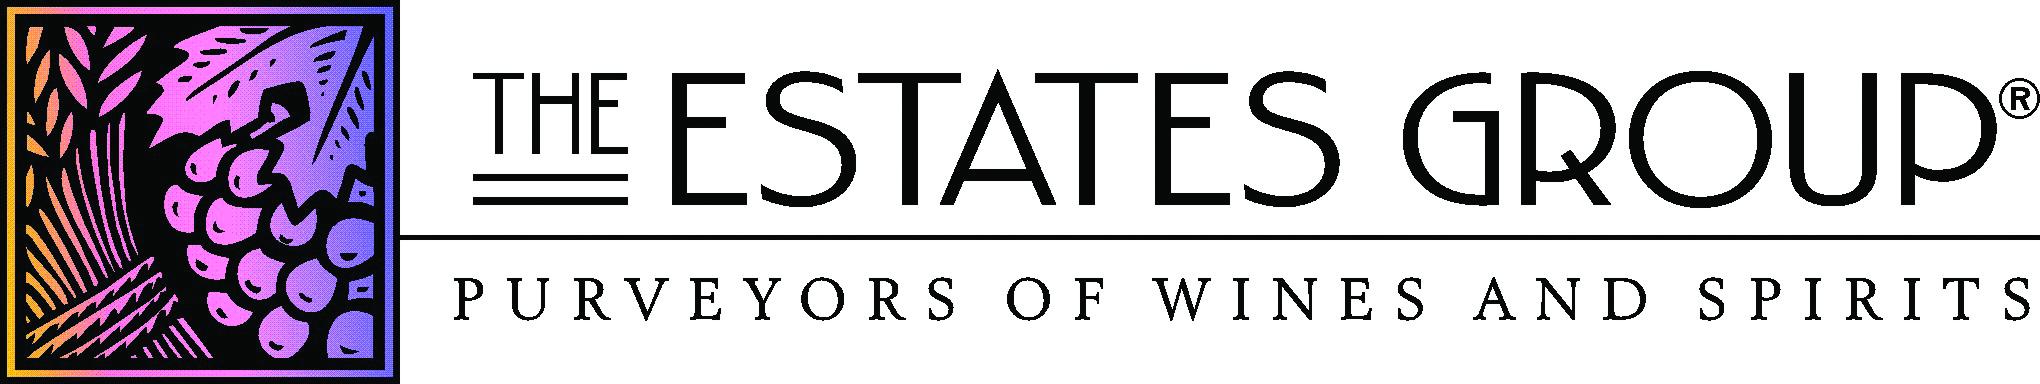 The Estates Group Logo.jpg